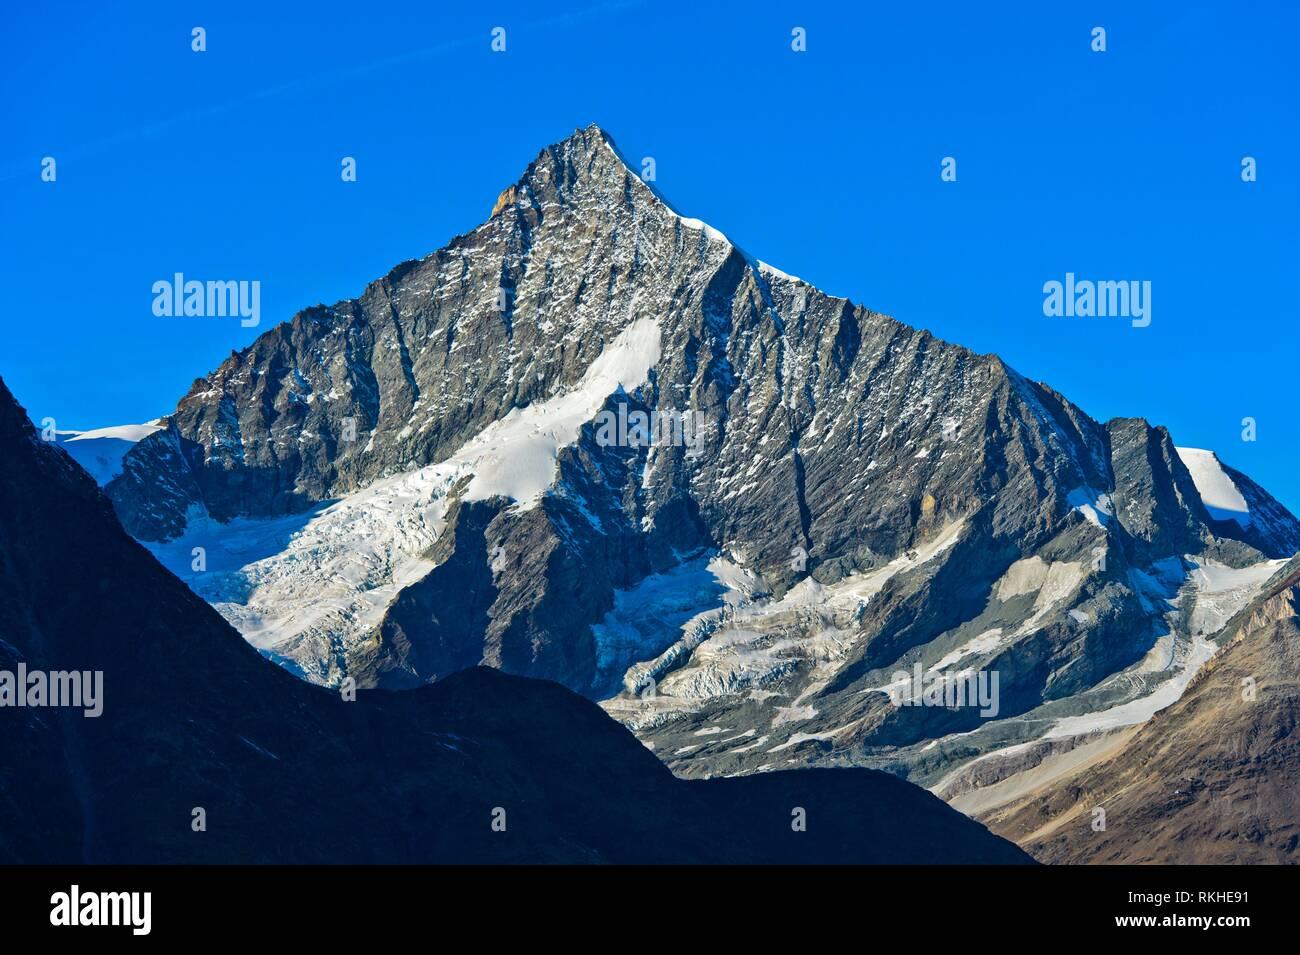 Rugged and symmetrical south face of the peak Weisshorn. Zermatt, Valais, Switzerland. - Stock Image